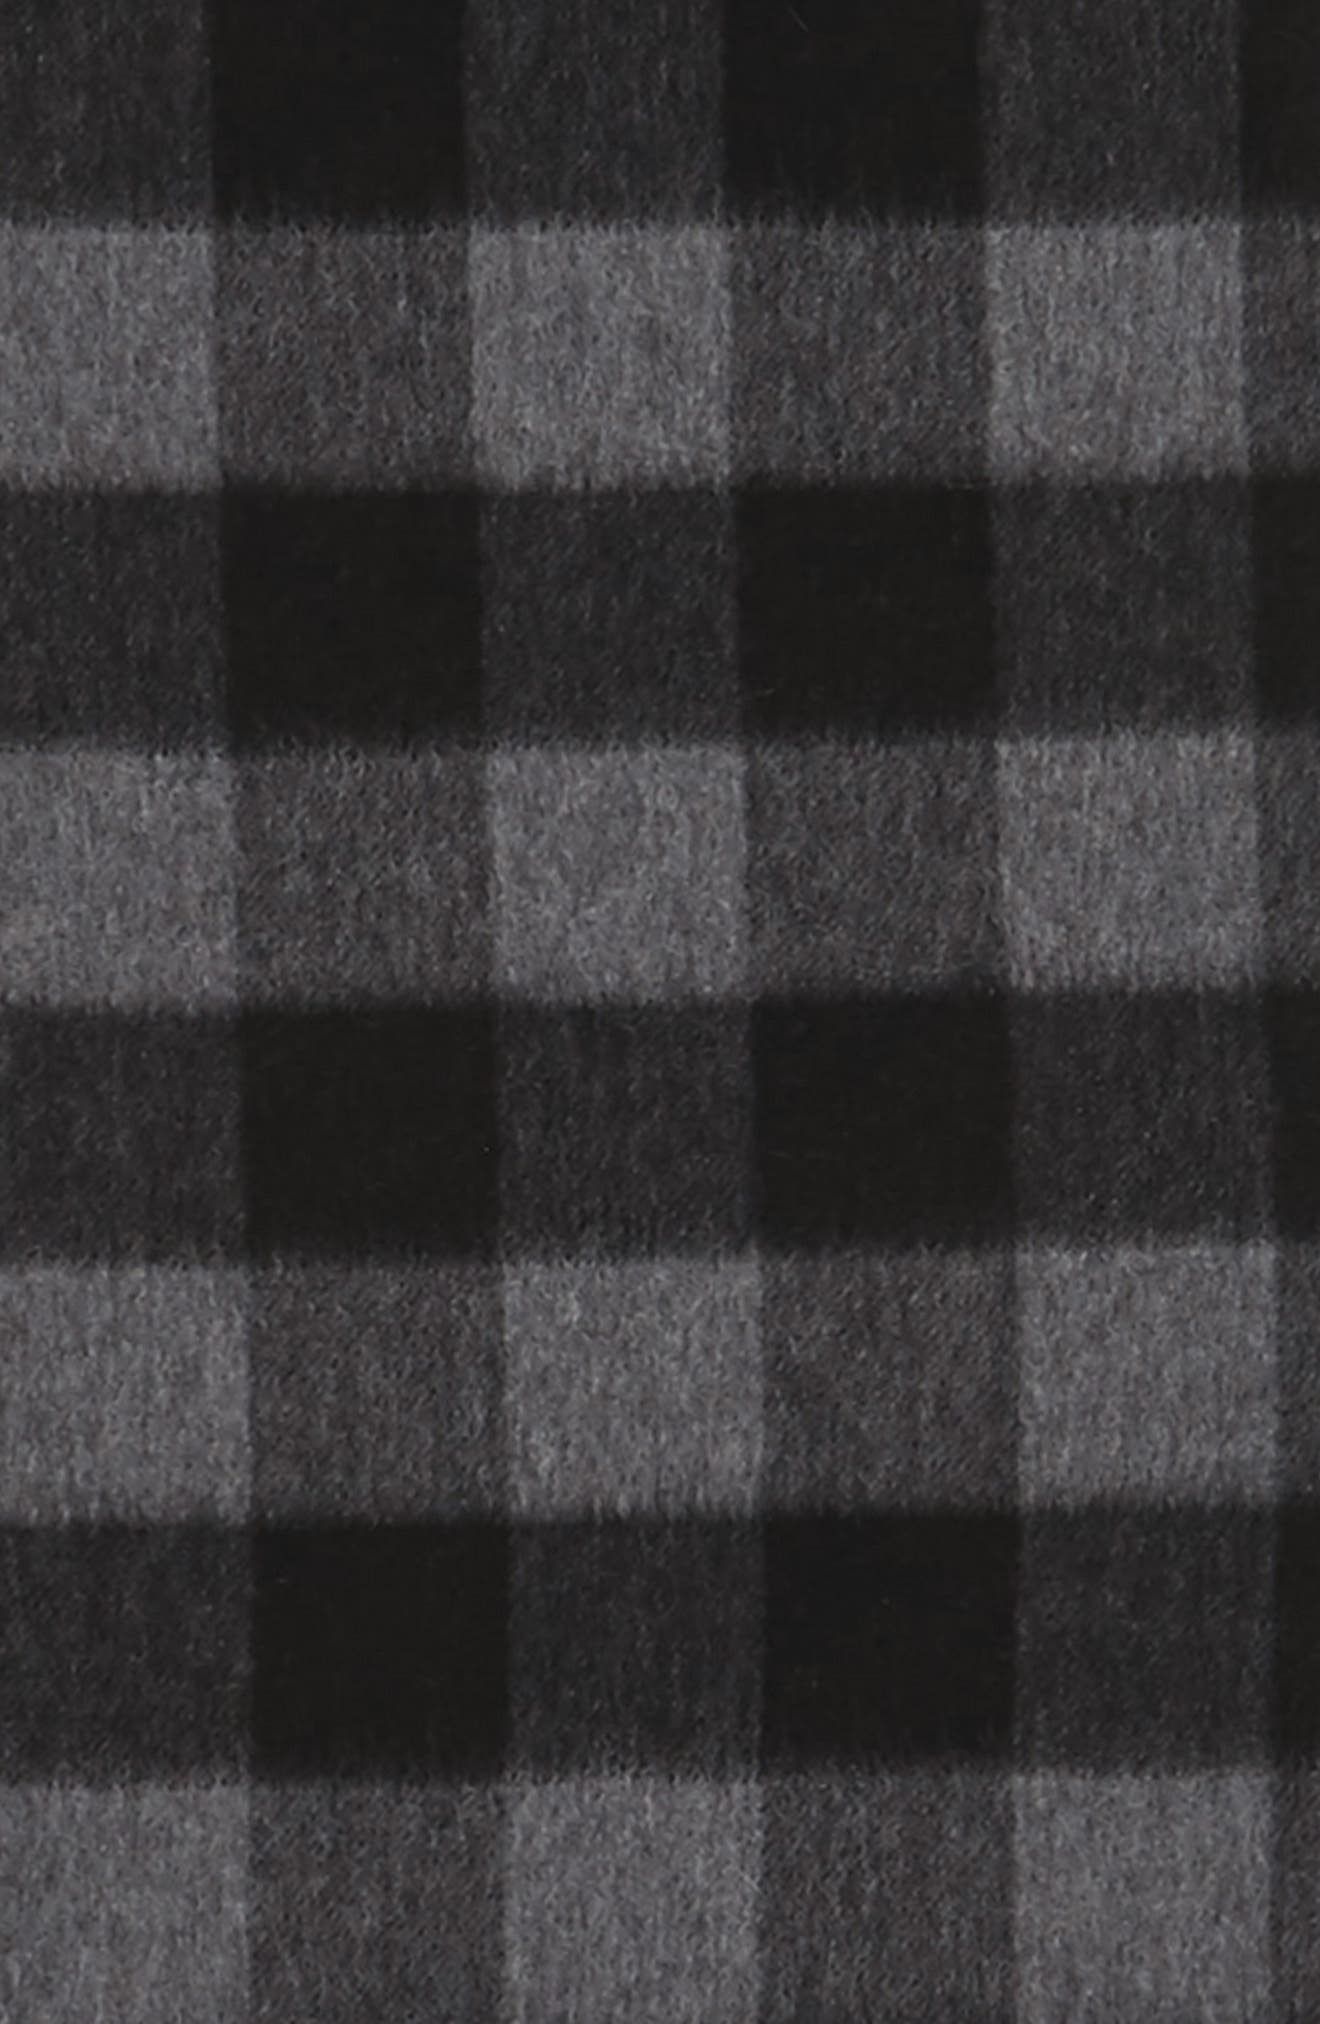 Check Cashmere Scarf,                             Alternate thumbnail 3, color,                             Grey Excalibur - Black Buffalo